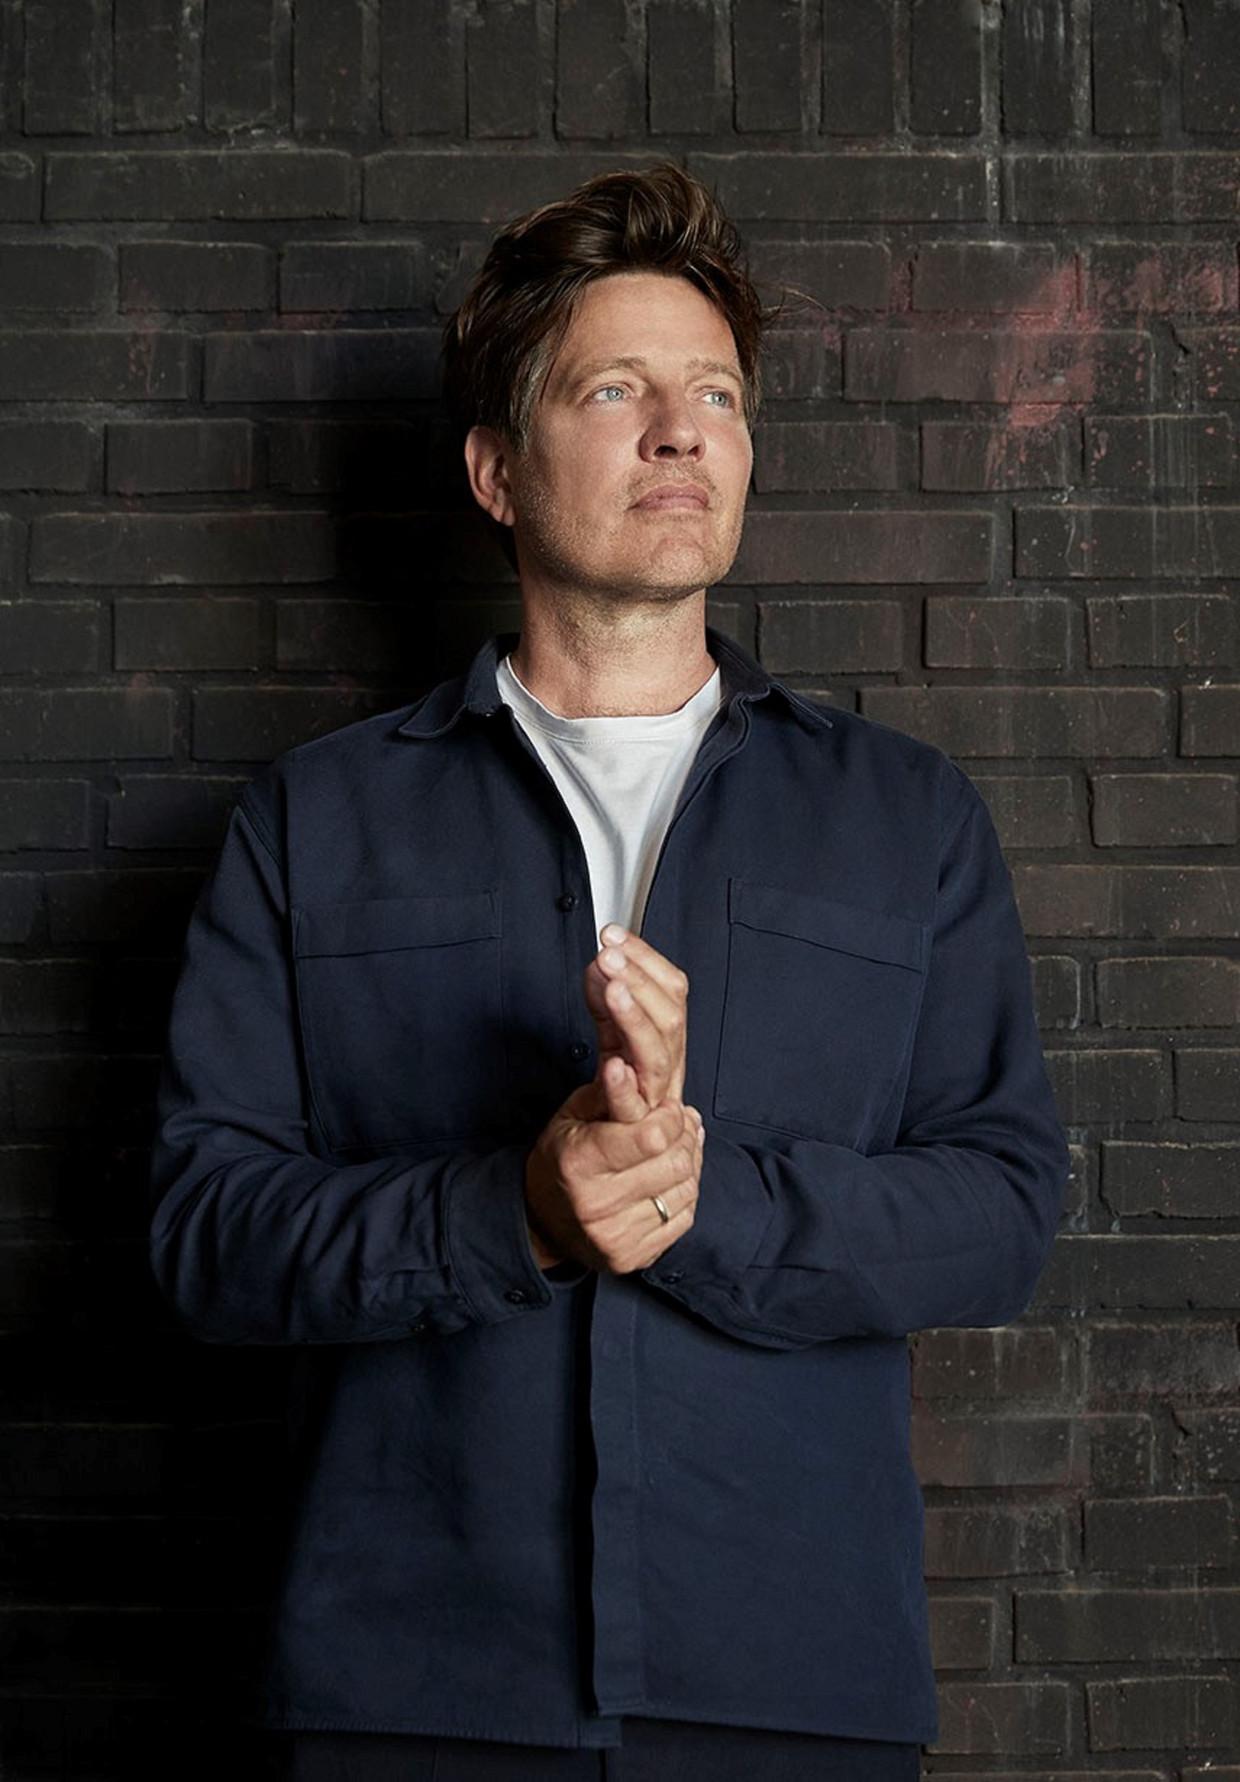 De Deense filmregisseur Thomas Vinterberg. Beeld